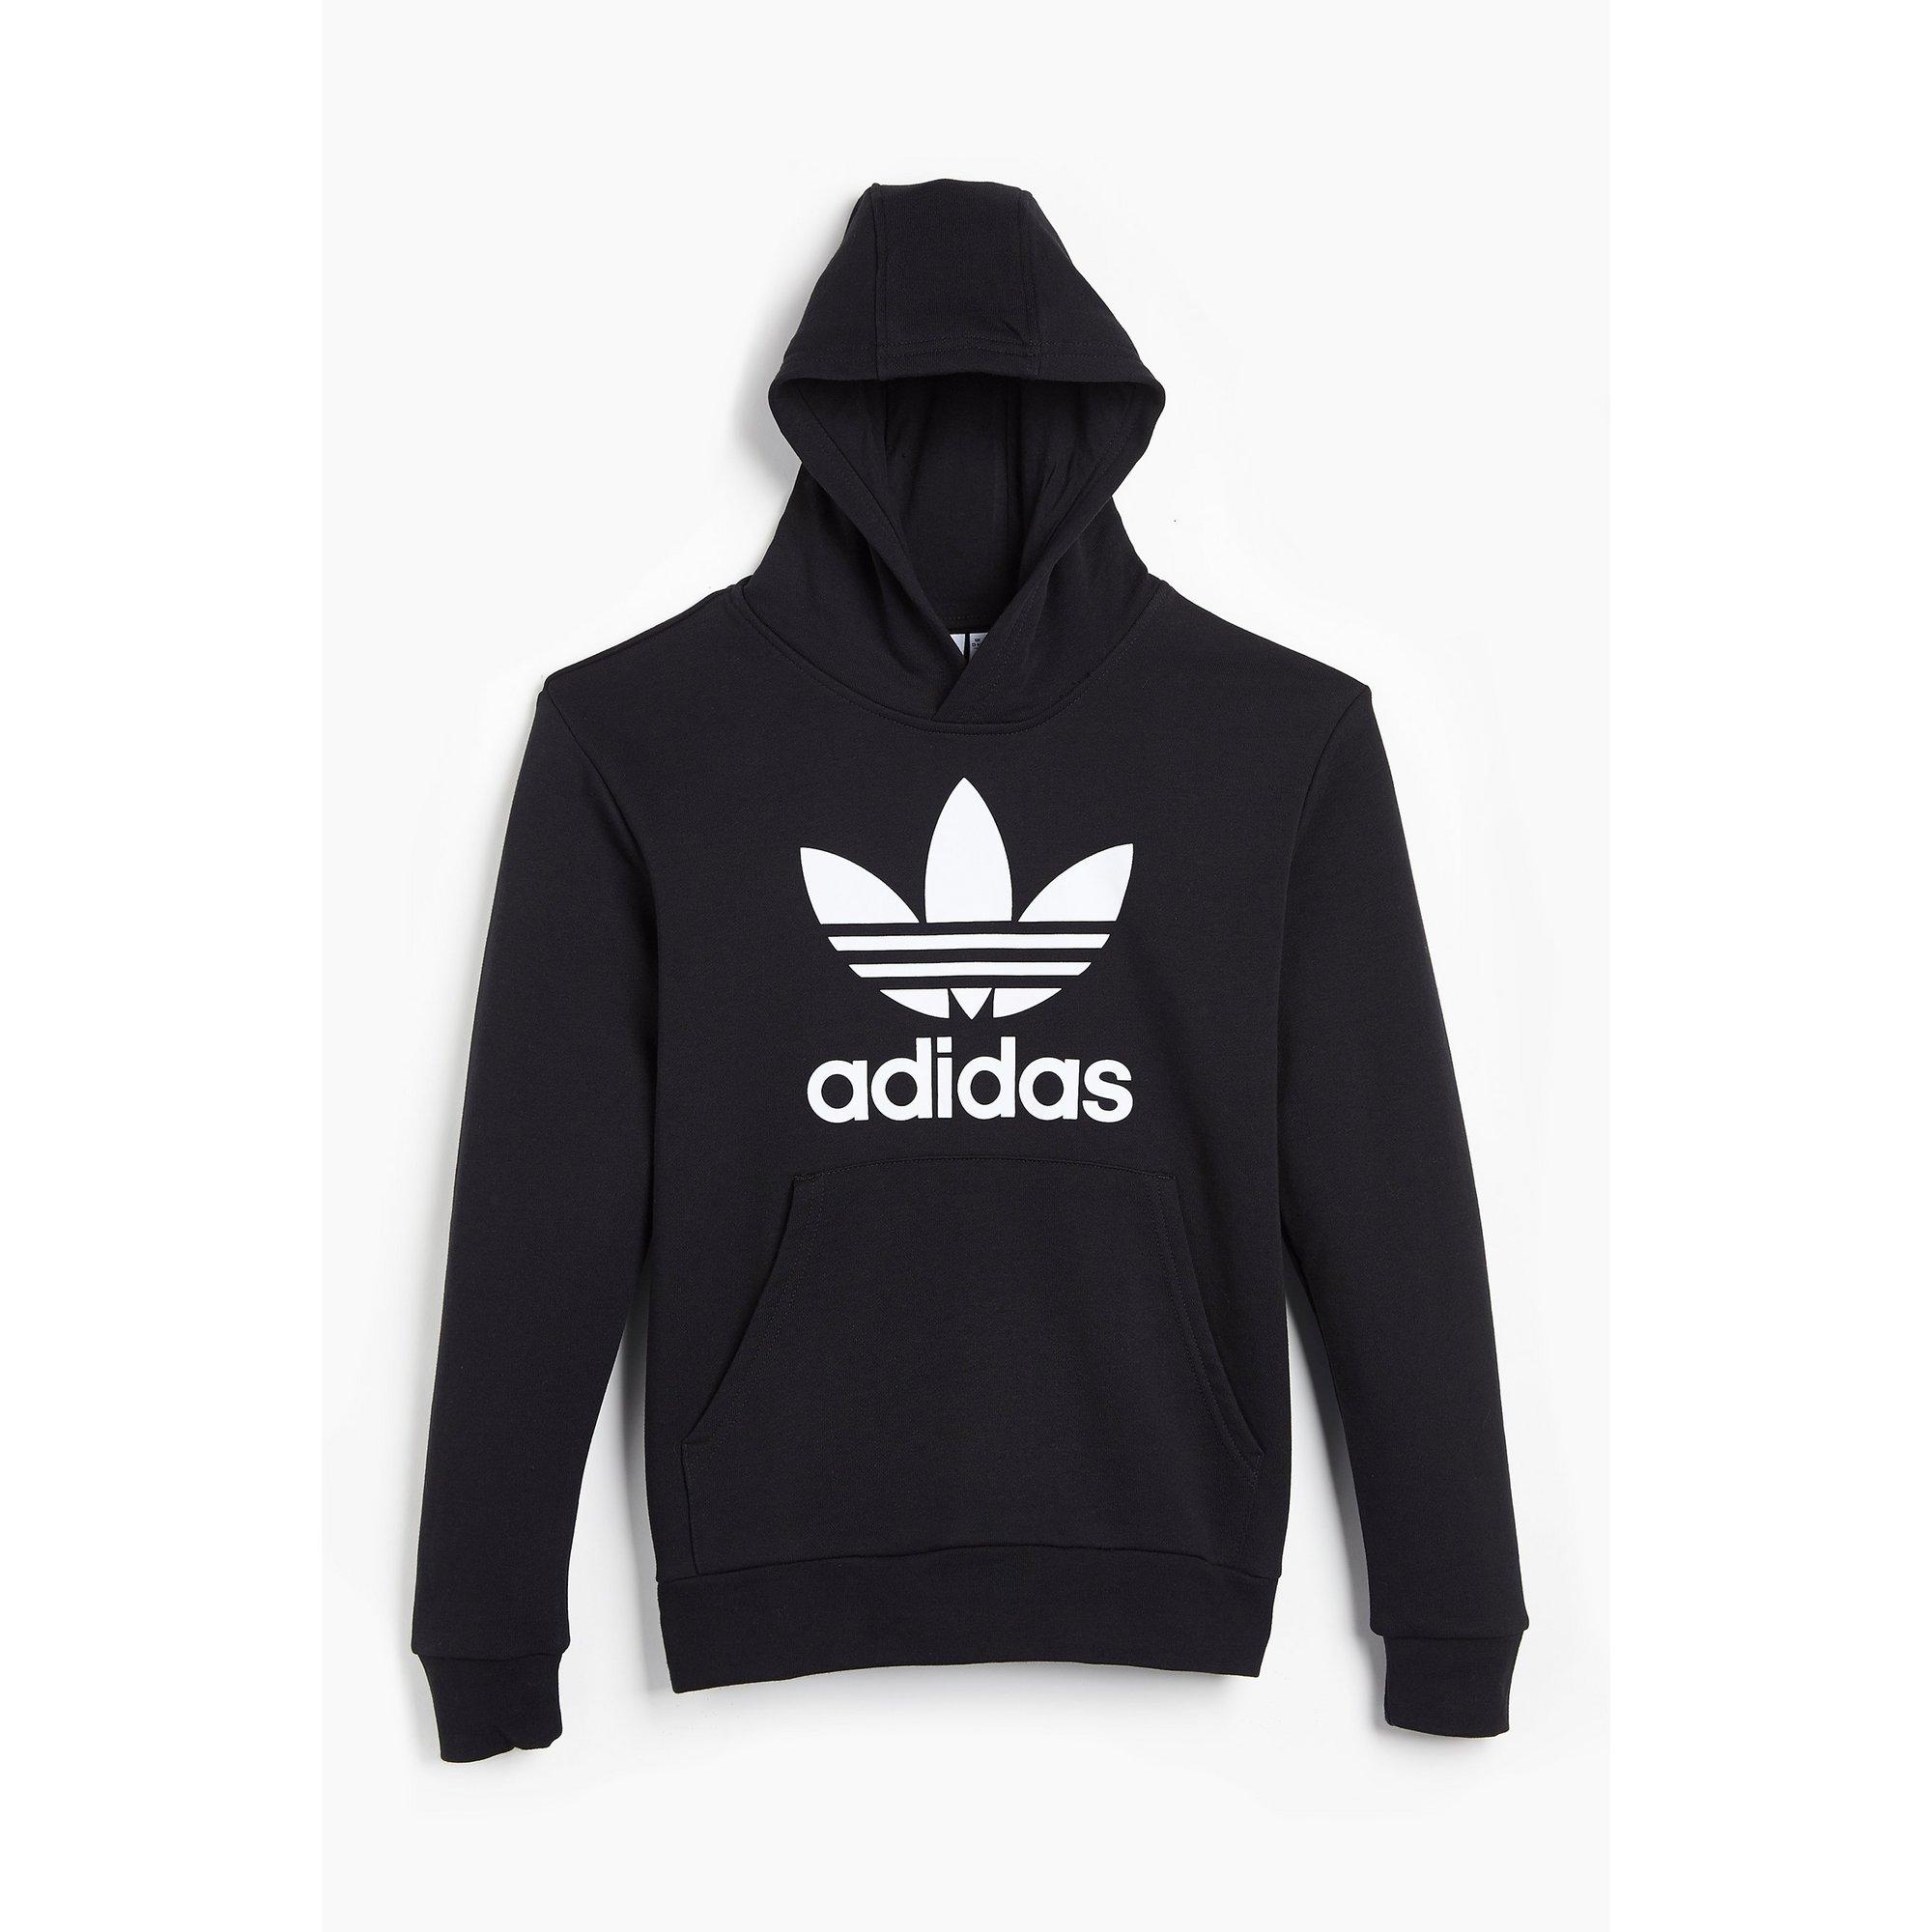 Image of Girls adidas Trefoil Black Hoody